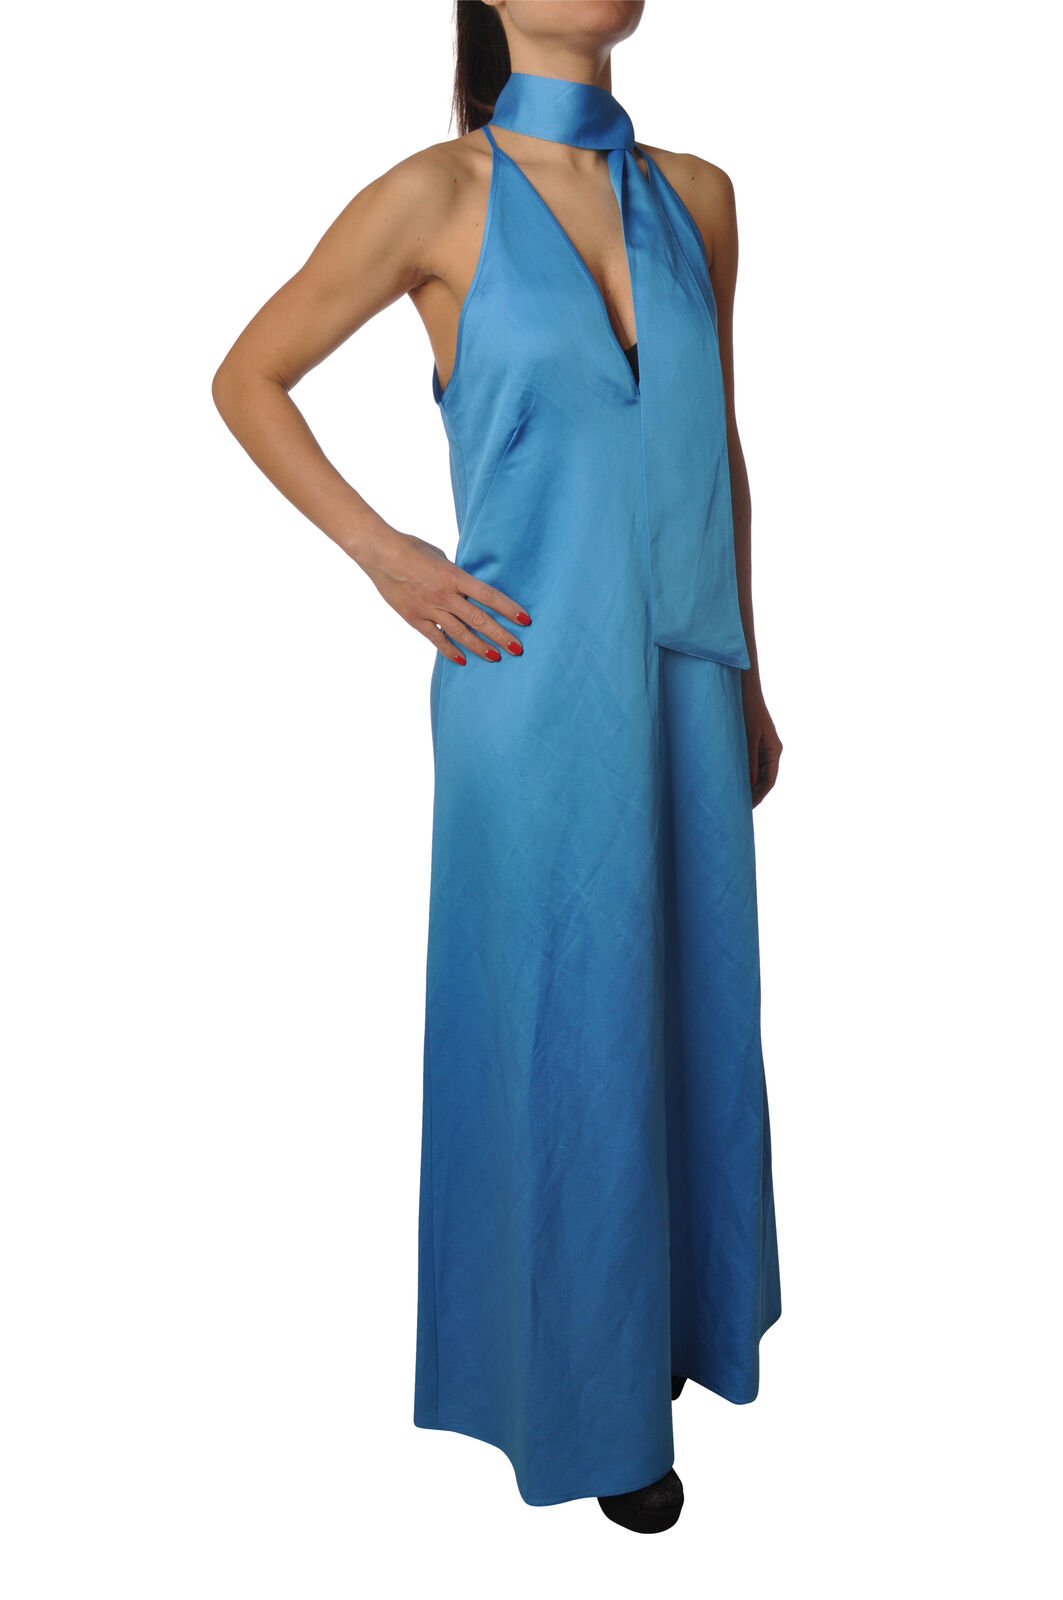 8pm - Dresses-Dress - Woman - bluee - 6104725C190637